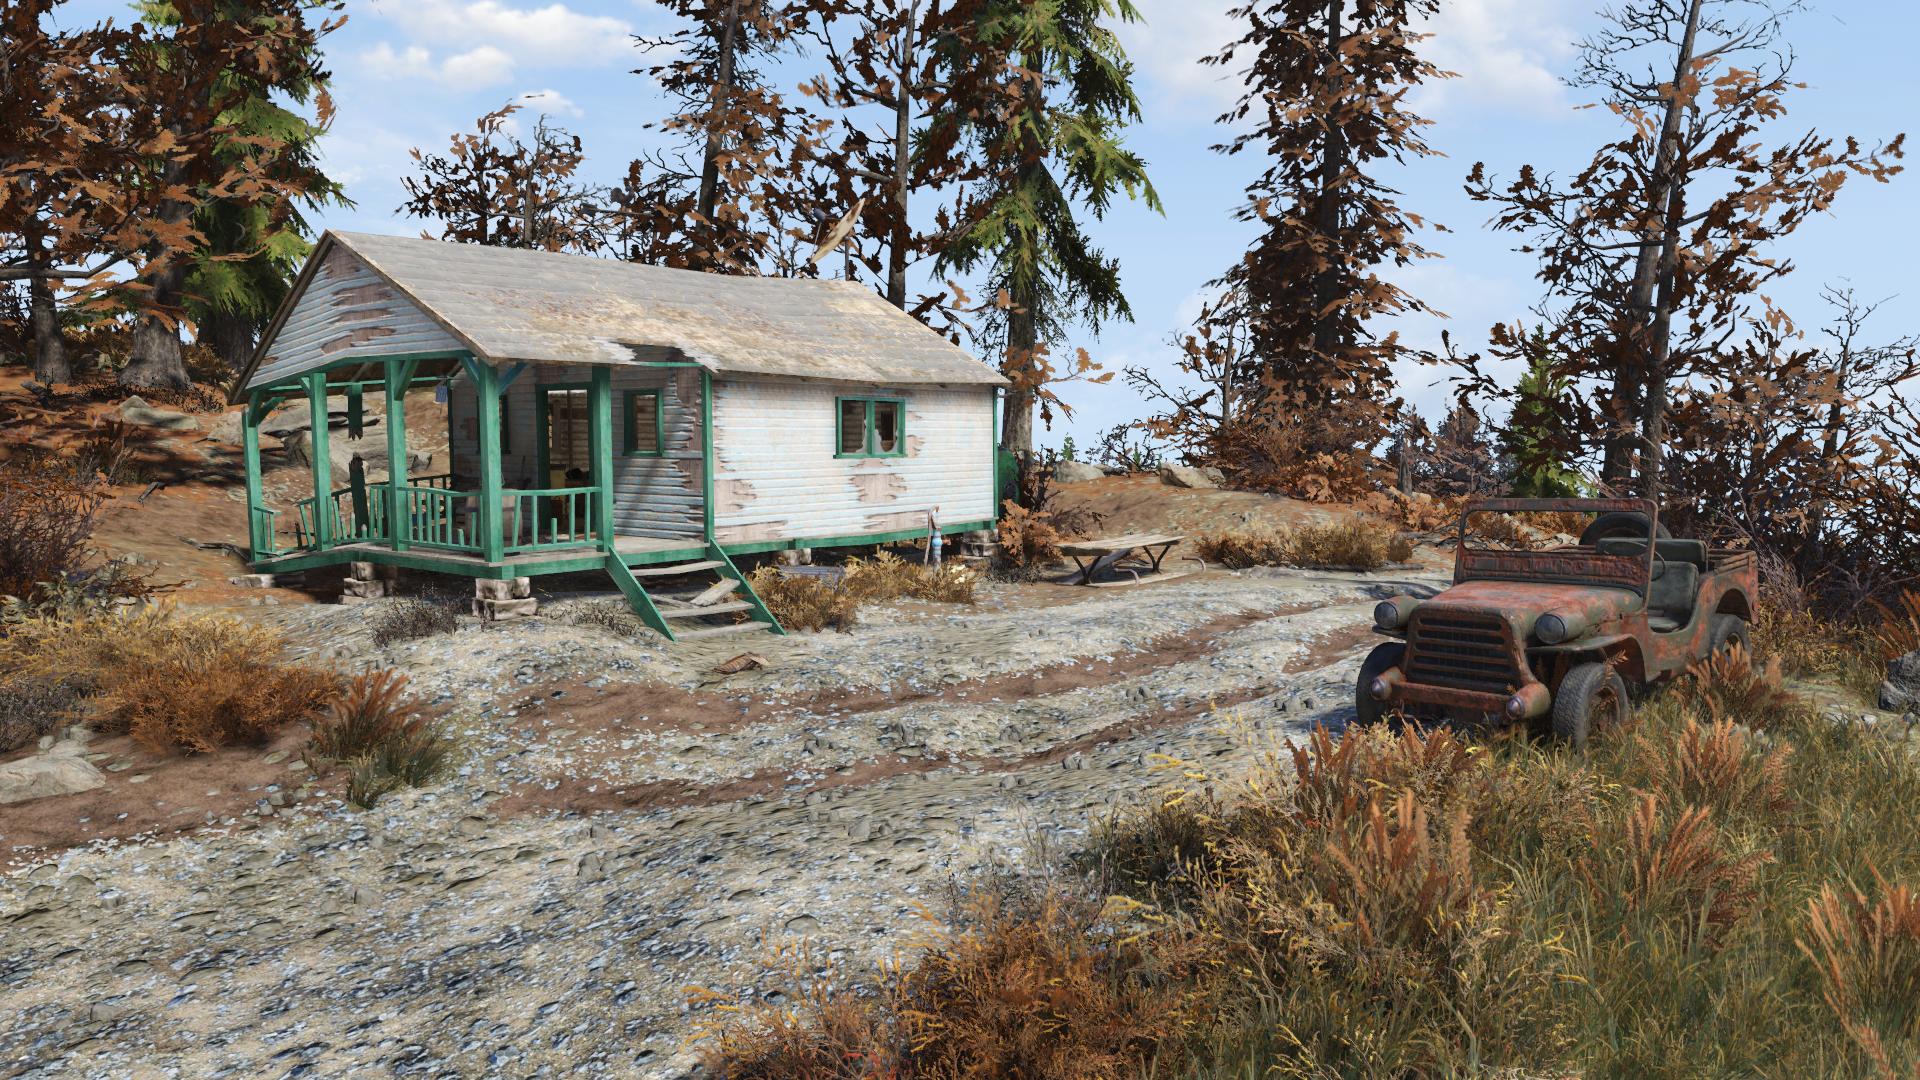 Investigator's cabin